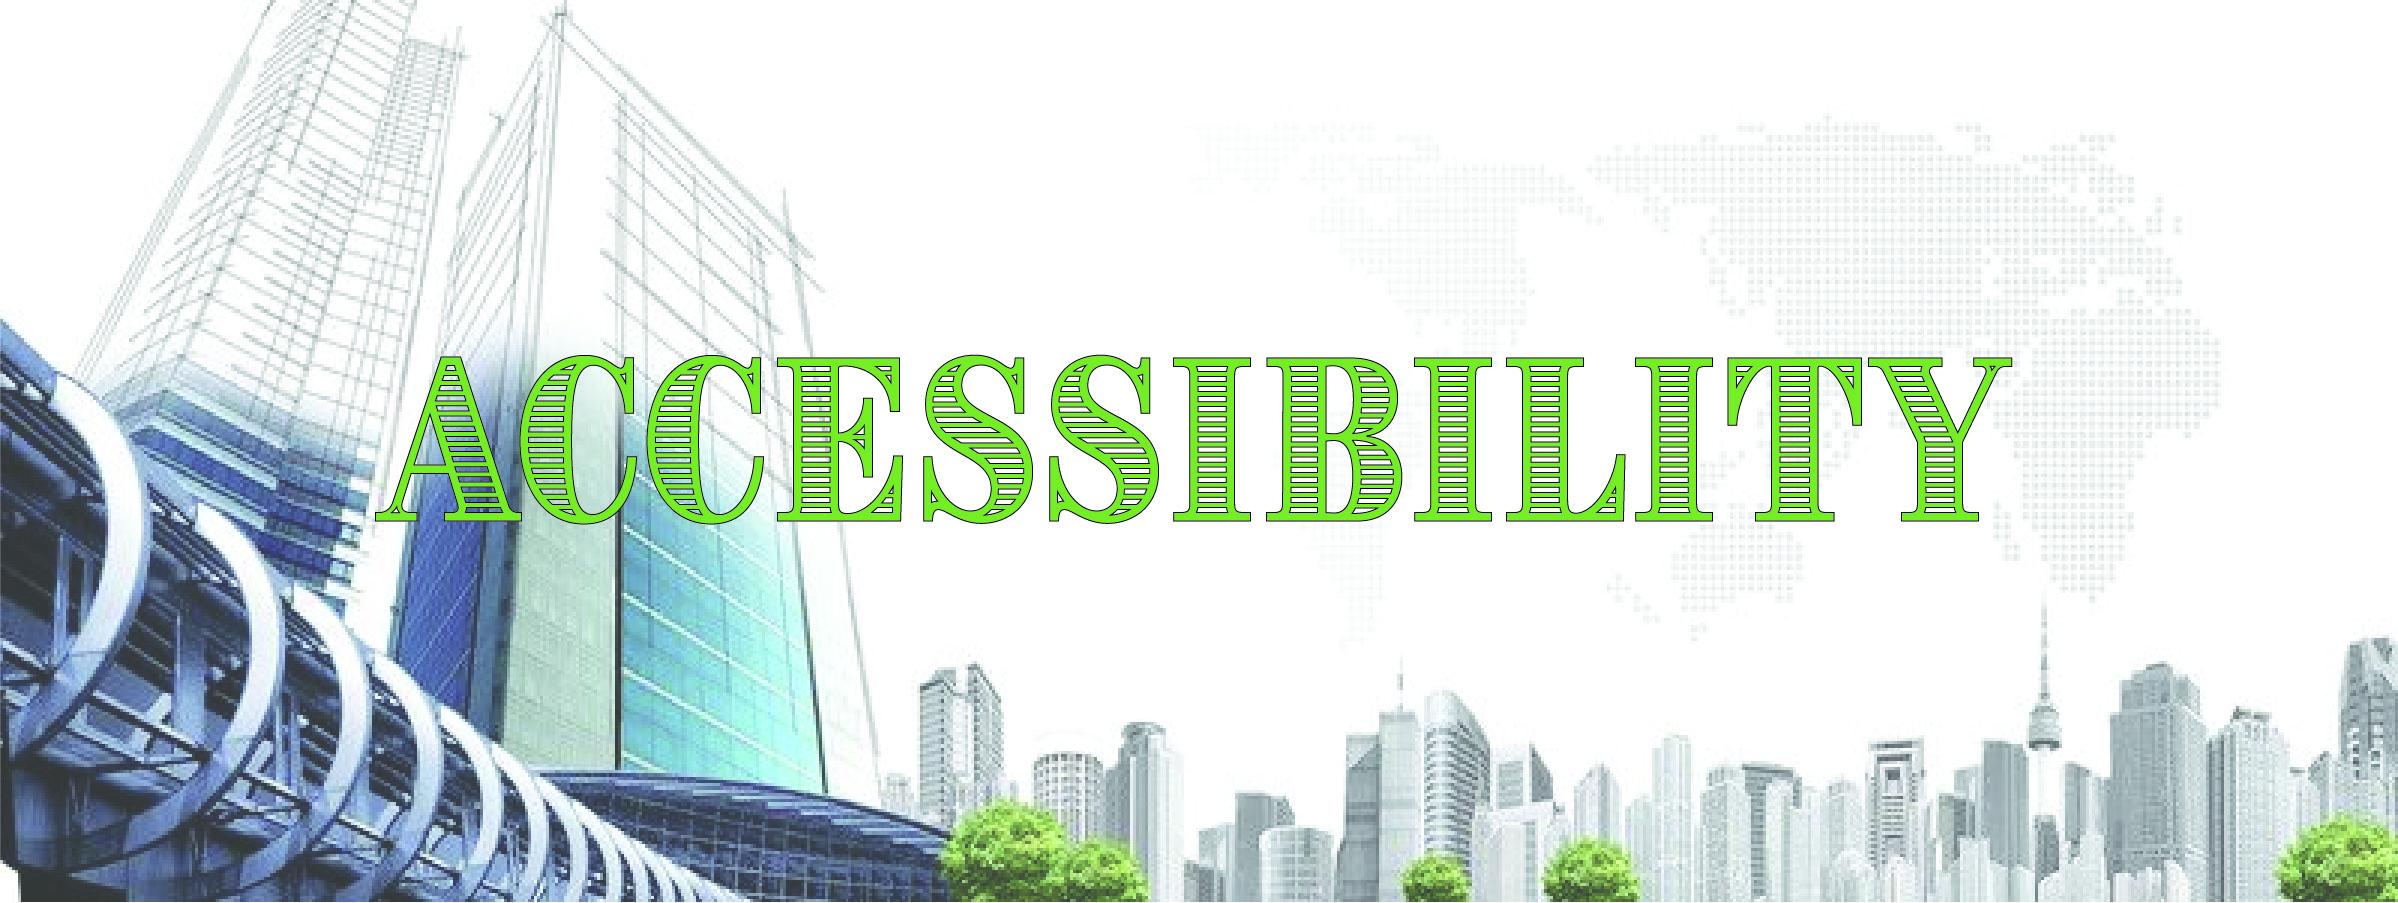 accesbility.jpg